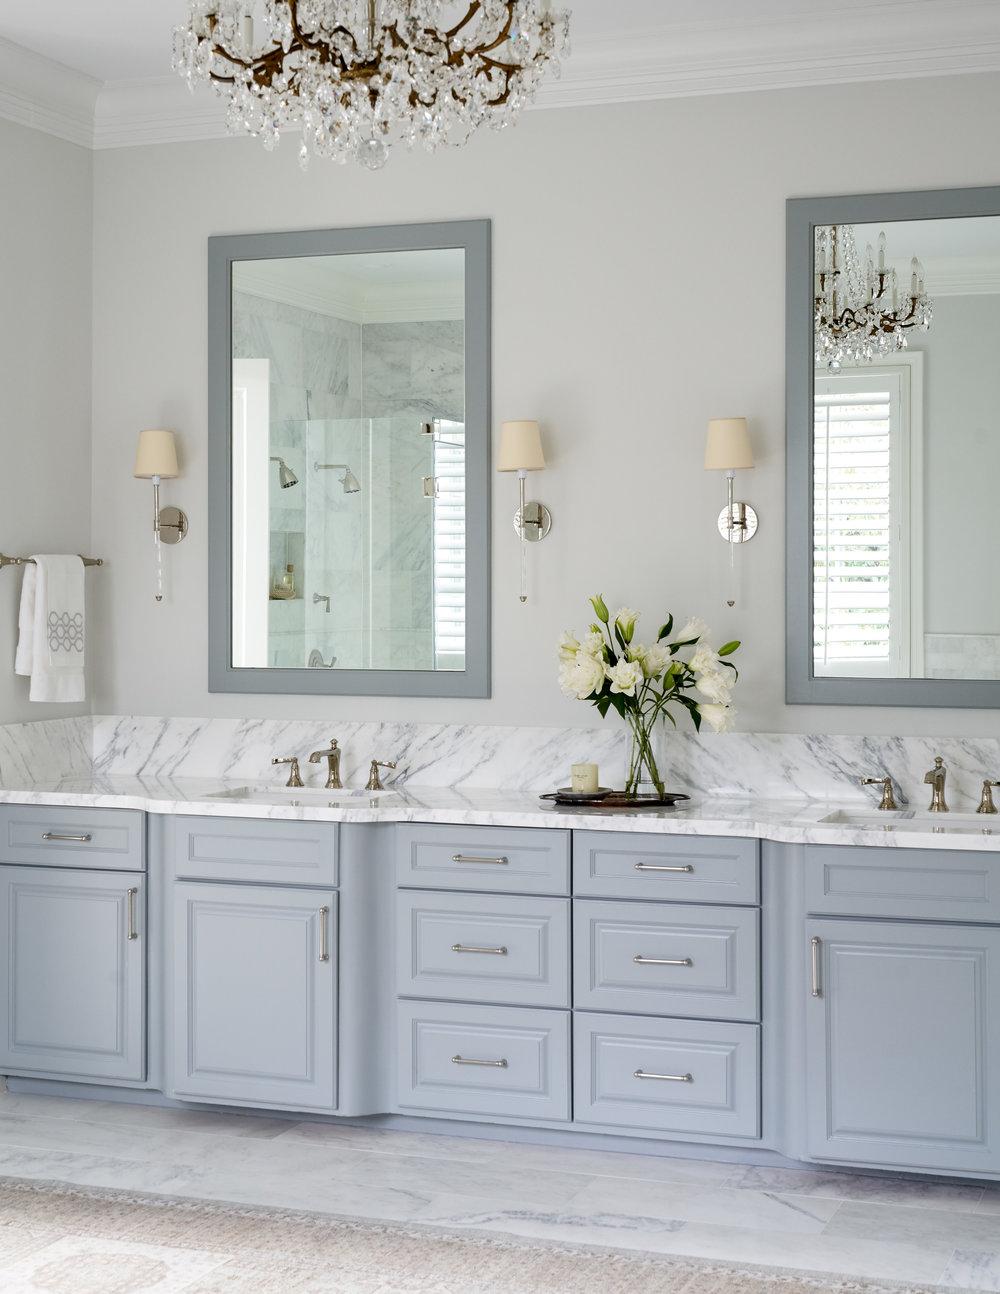 Bathroom design by Beth Lindsey Interior Design.